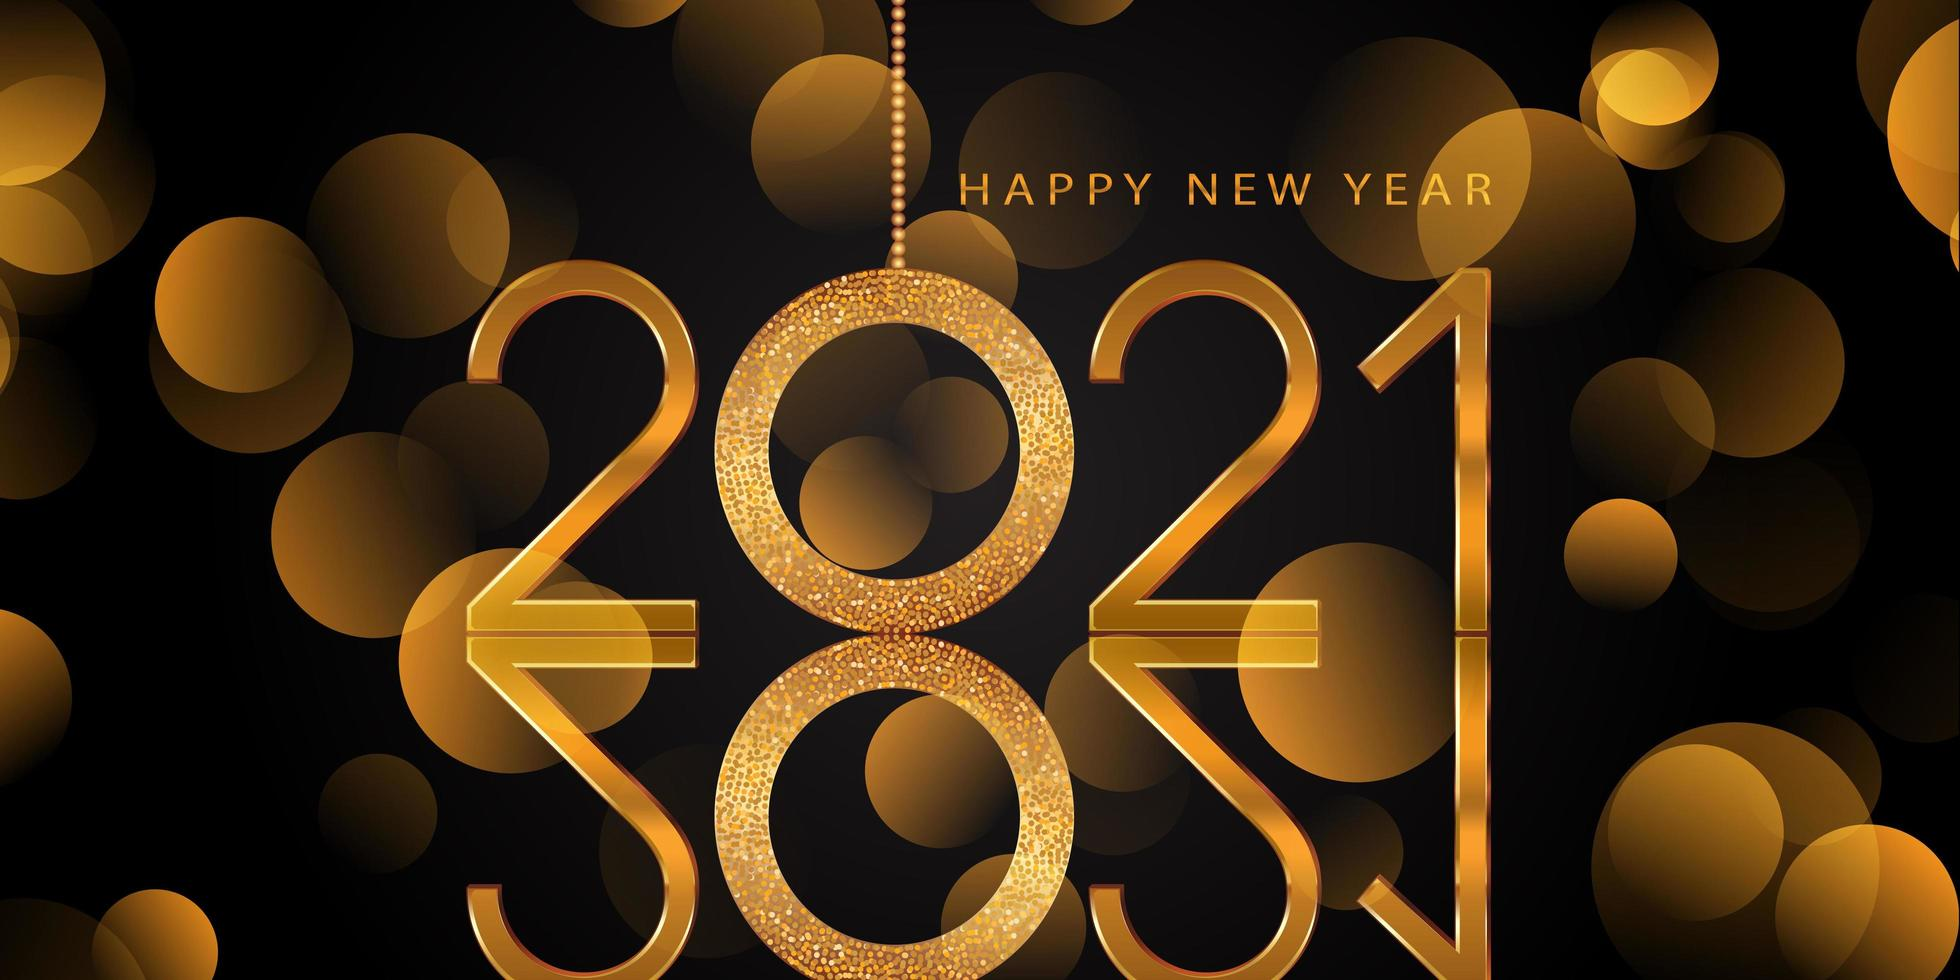 Elegant glittery gold Happy New Year background vector